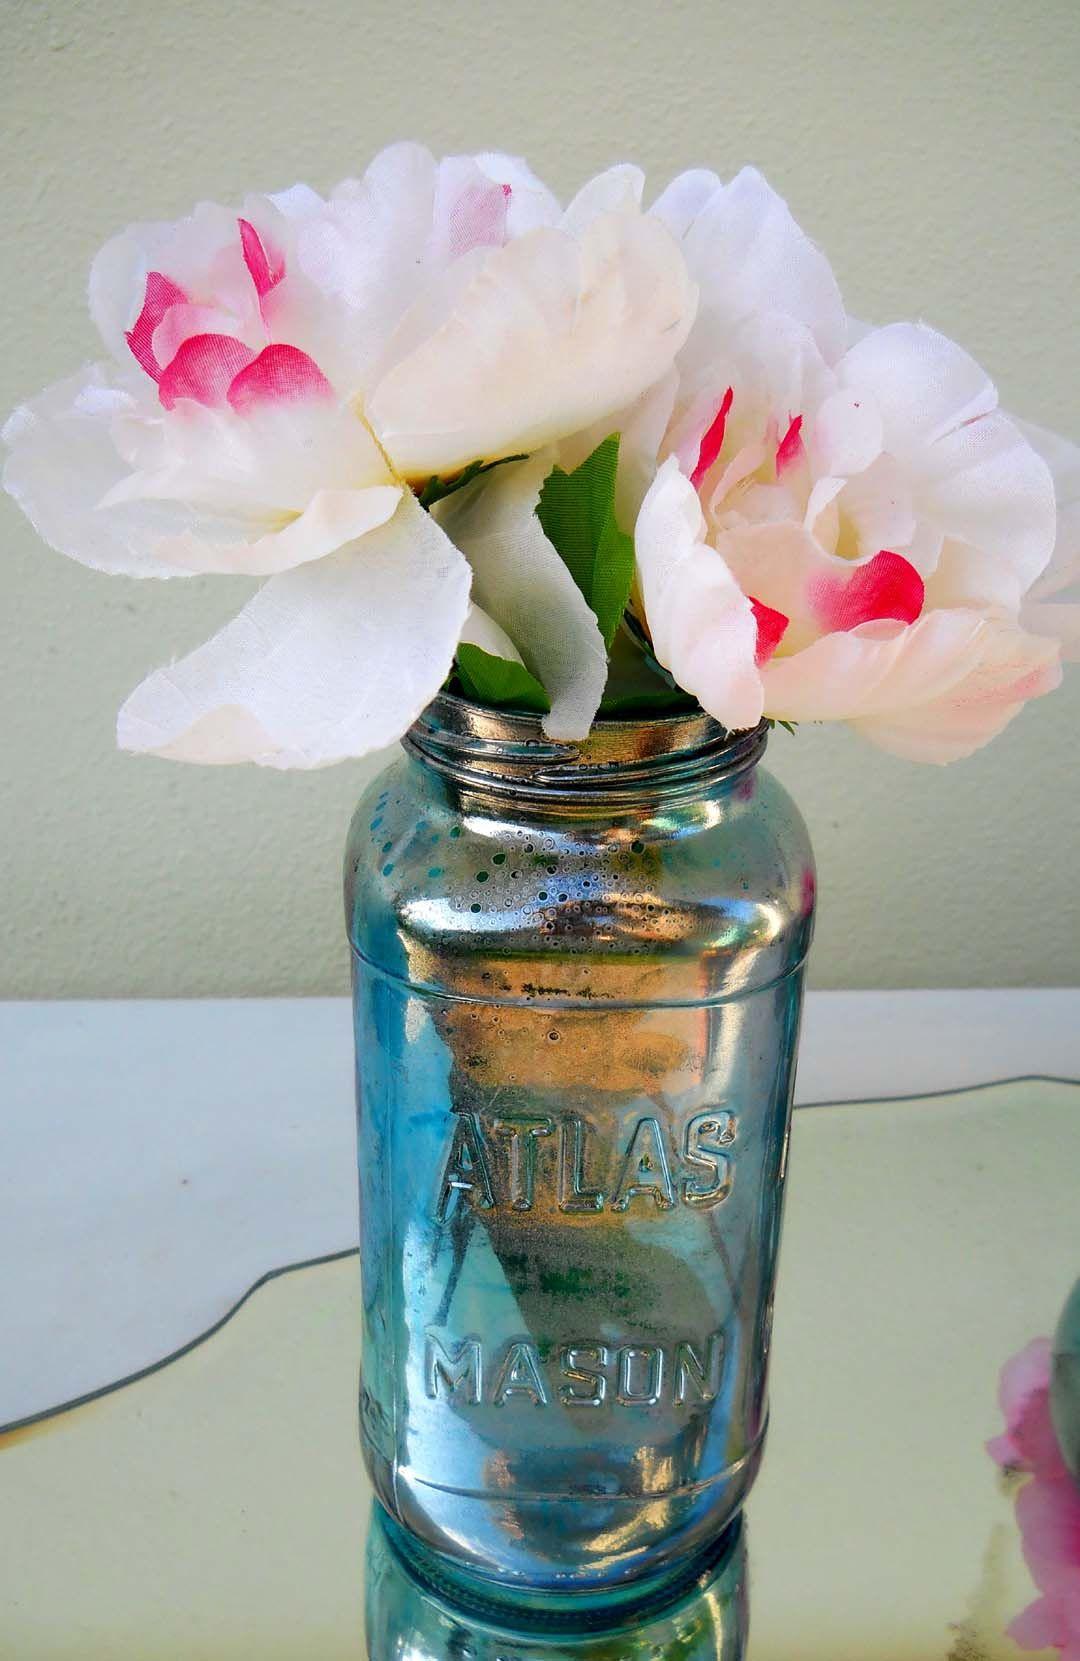 diy mercury glass vase of diy faux mercury glass in any color mercury glass projects inside viola blue atlas mason sm 1080a—1661 more